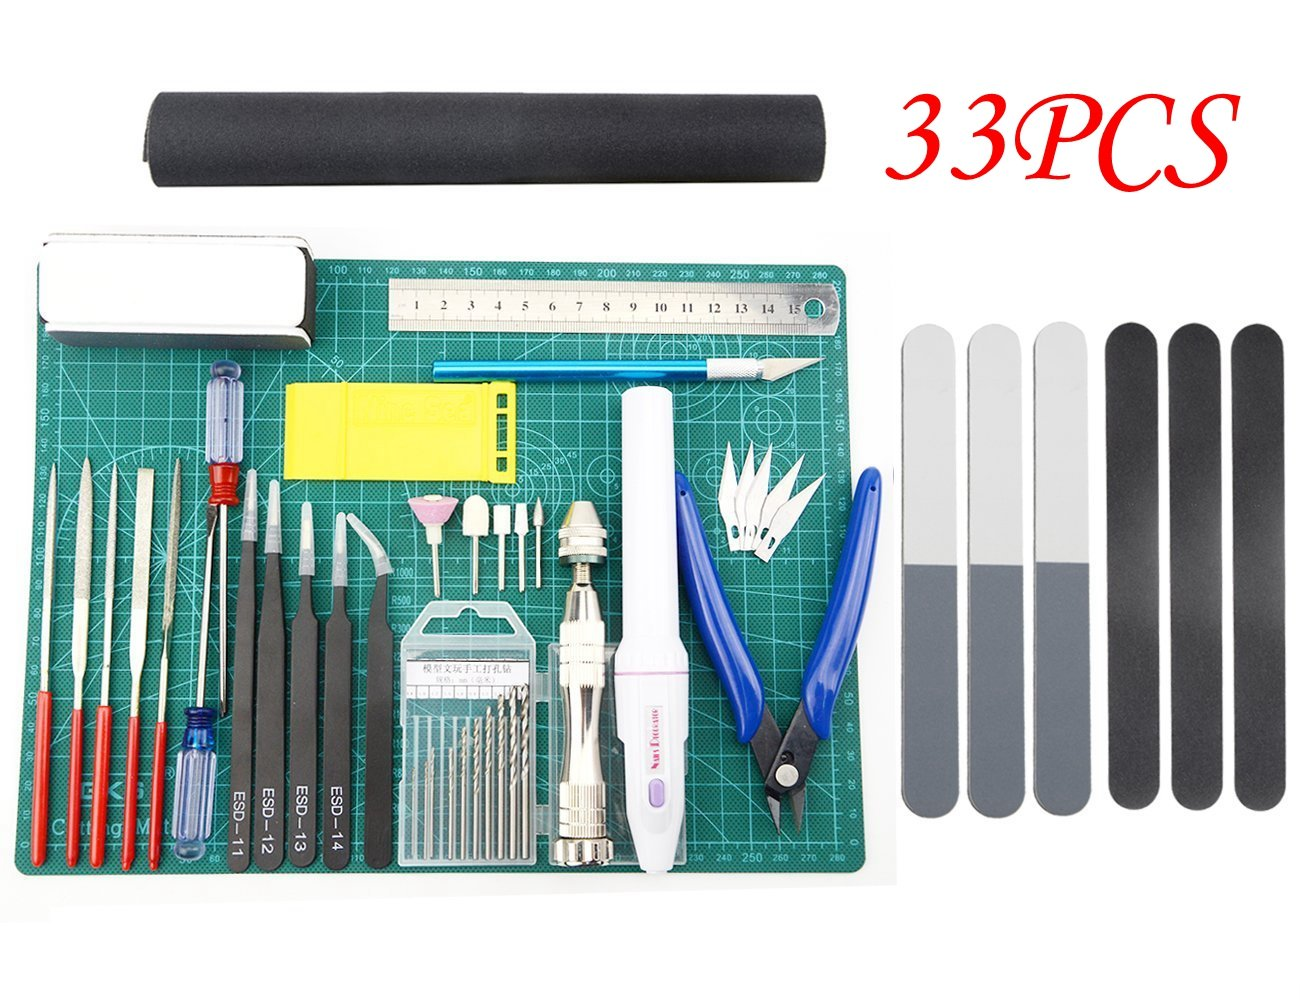 BXQINLENX Professional 33 PCS Gundam Modeler Basic Tools Craft Set for Car Airplane Building Model Assemble Building(J)